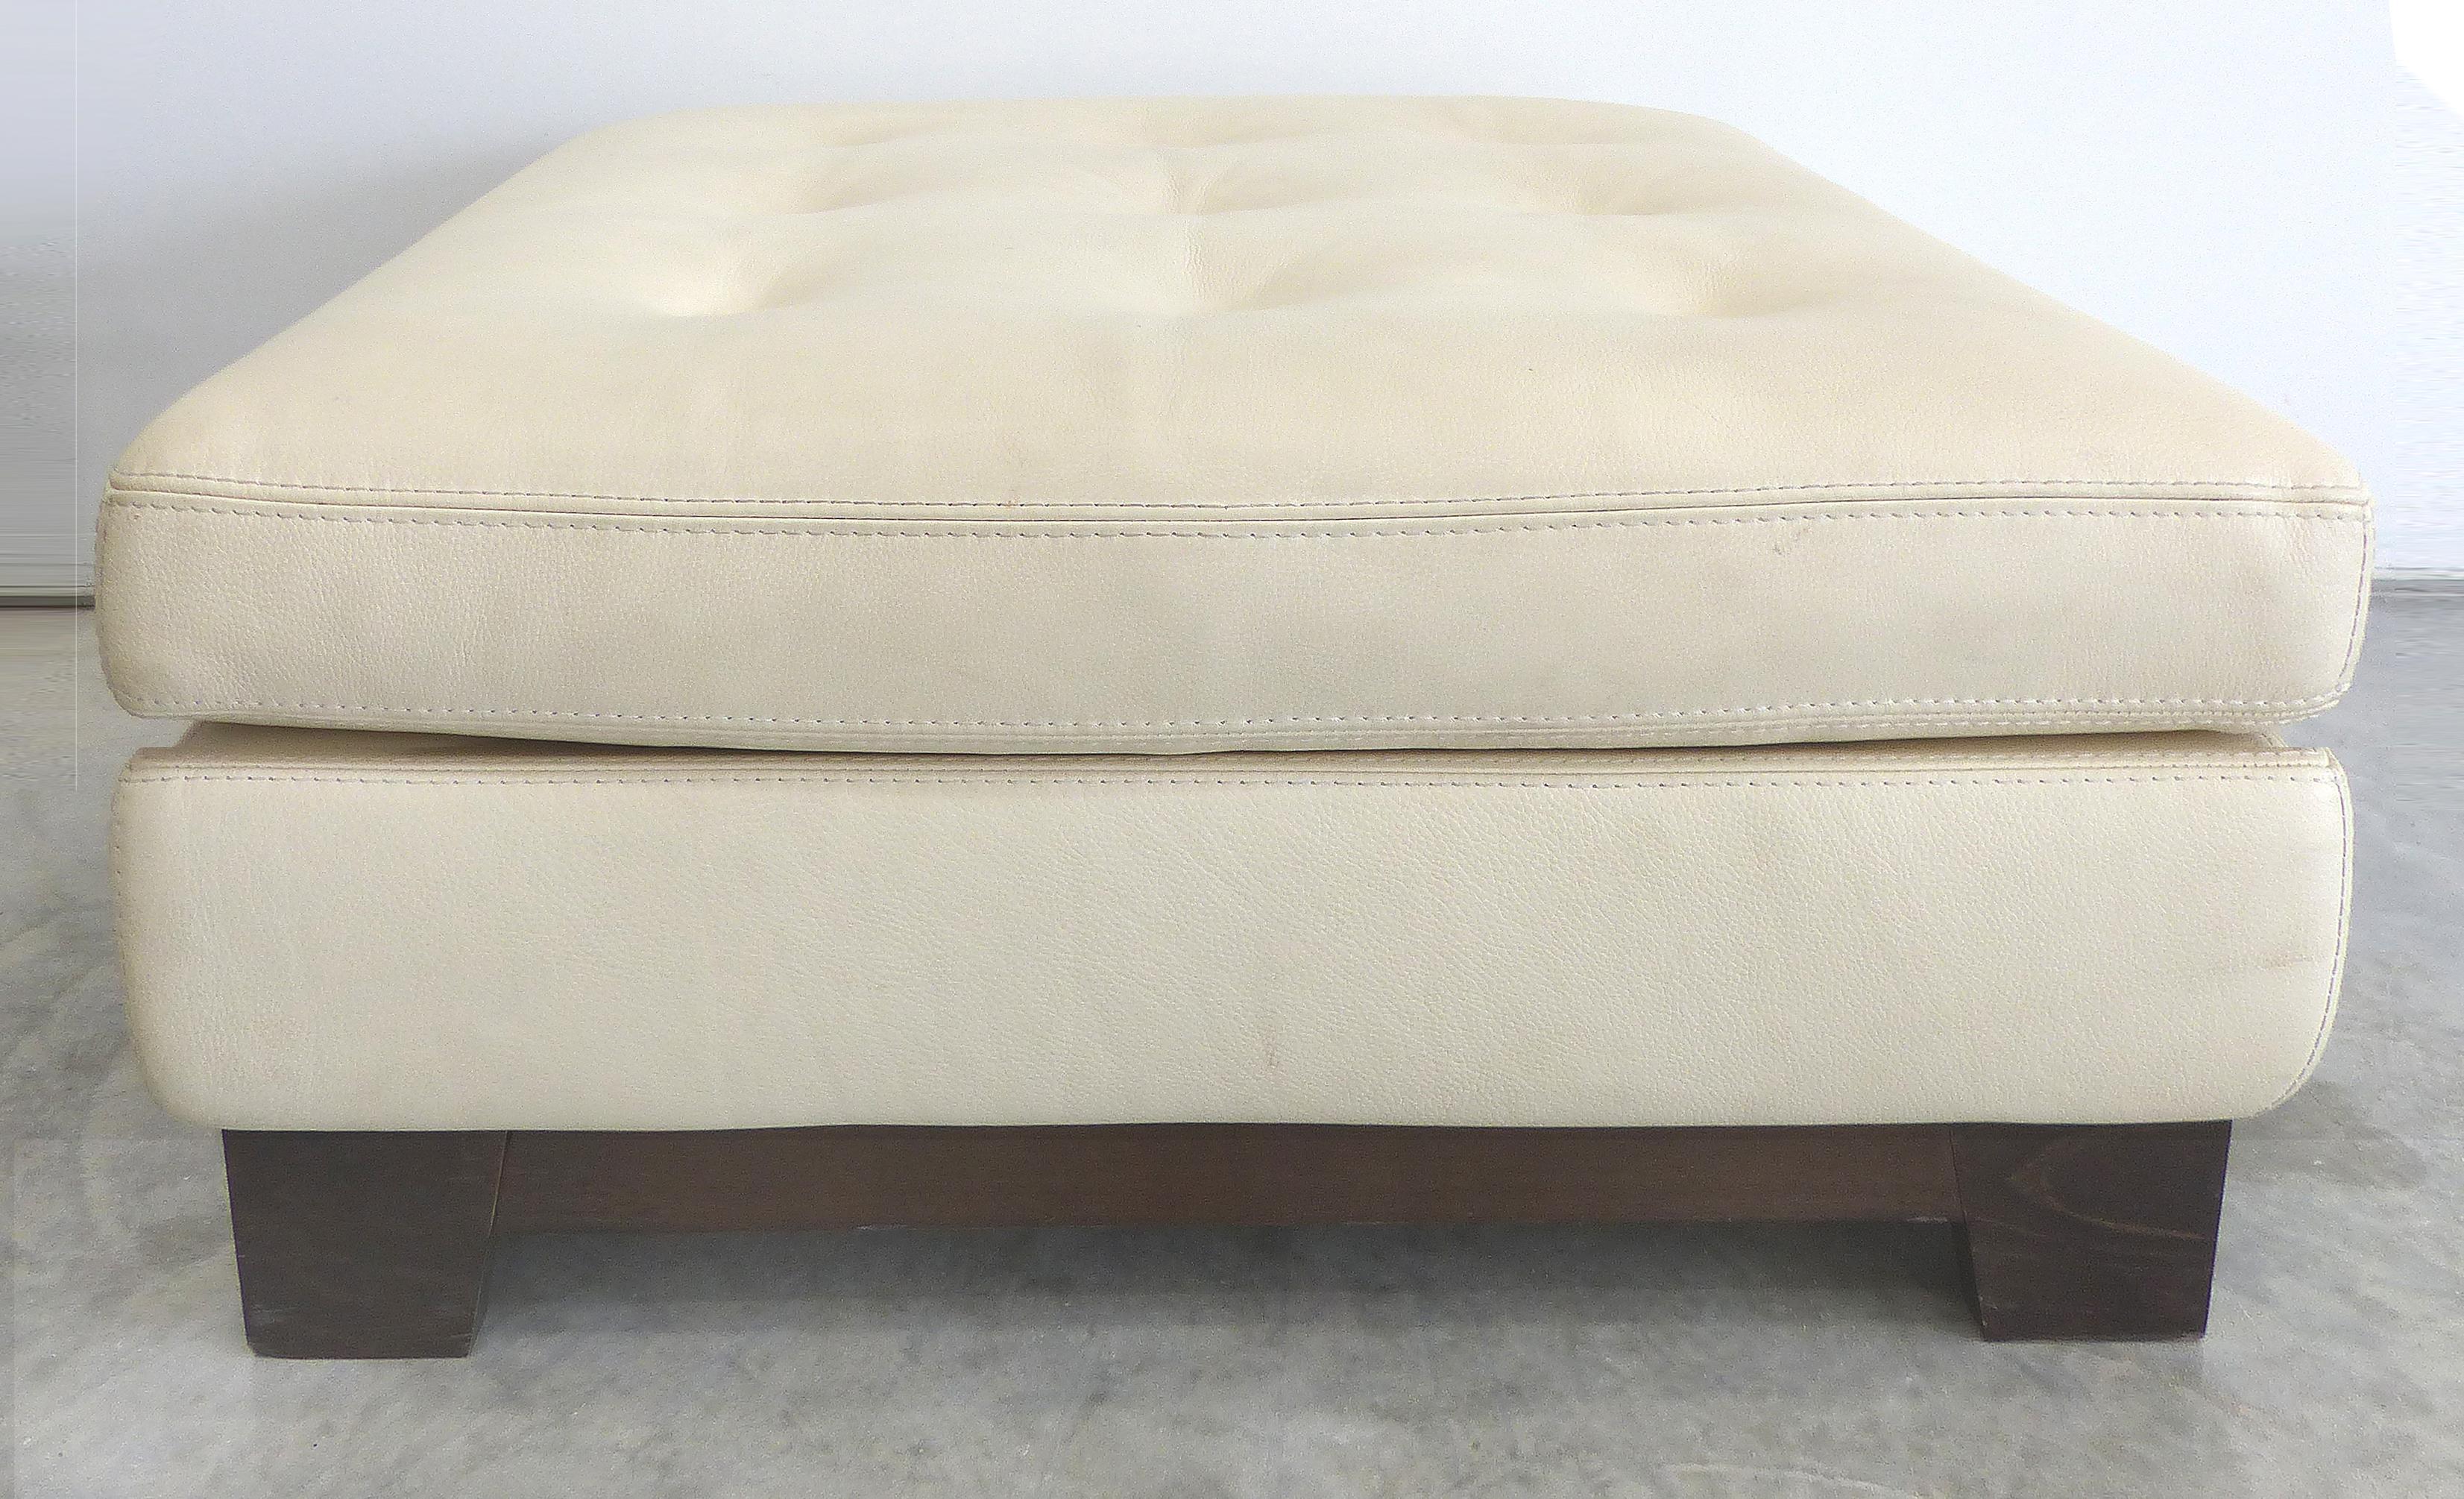 image of roche bobois white leather ottoman